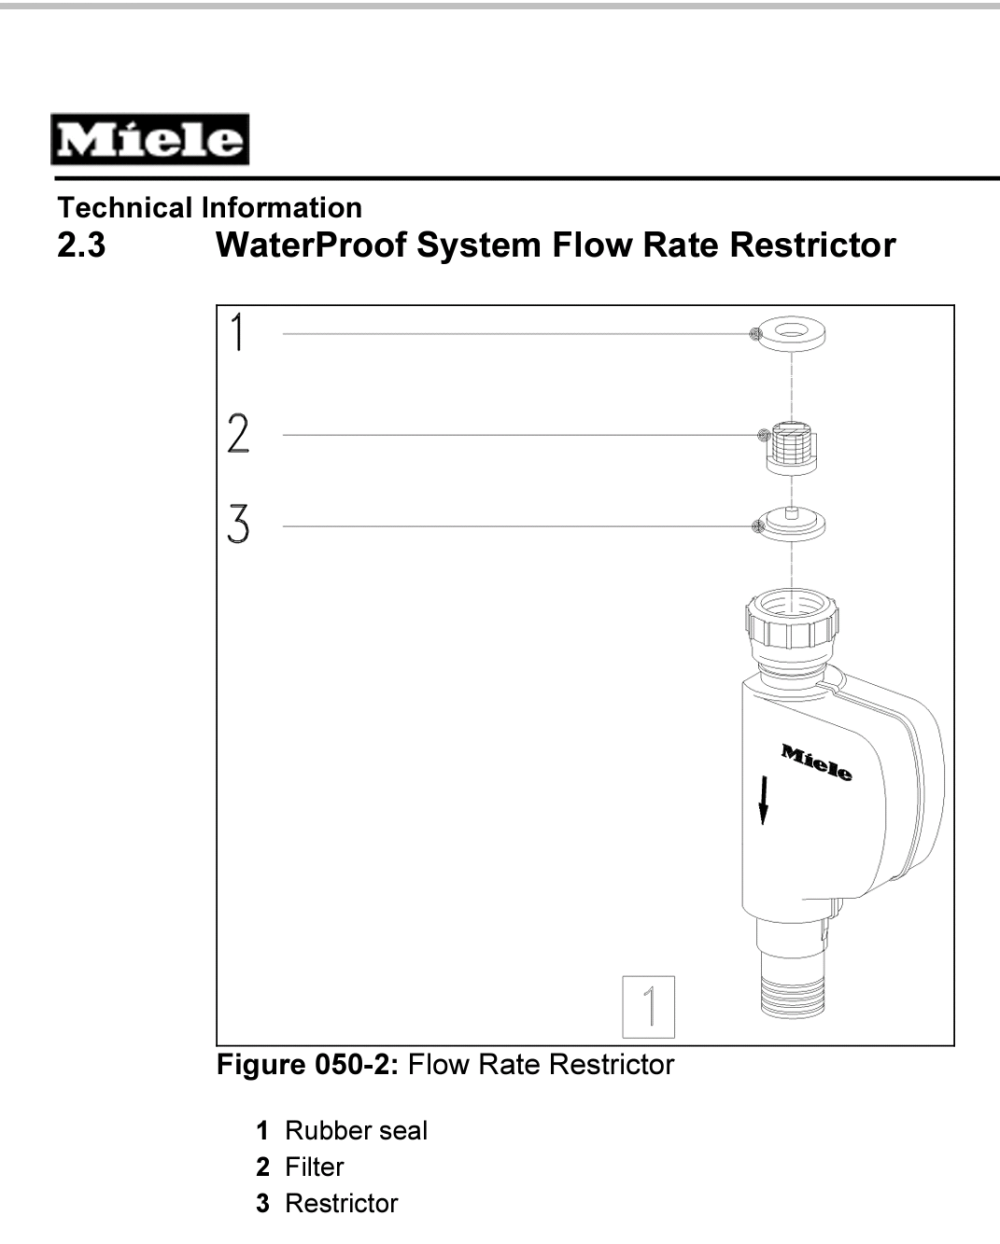 medium resolution of miele dishwasher wps diagram